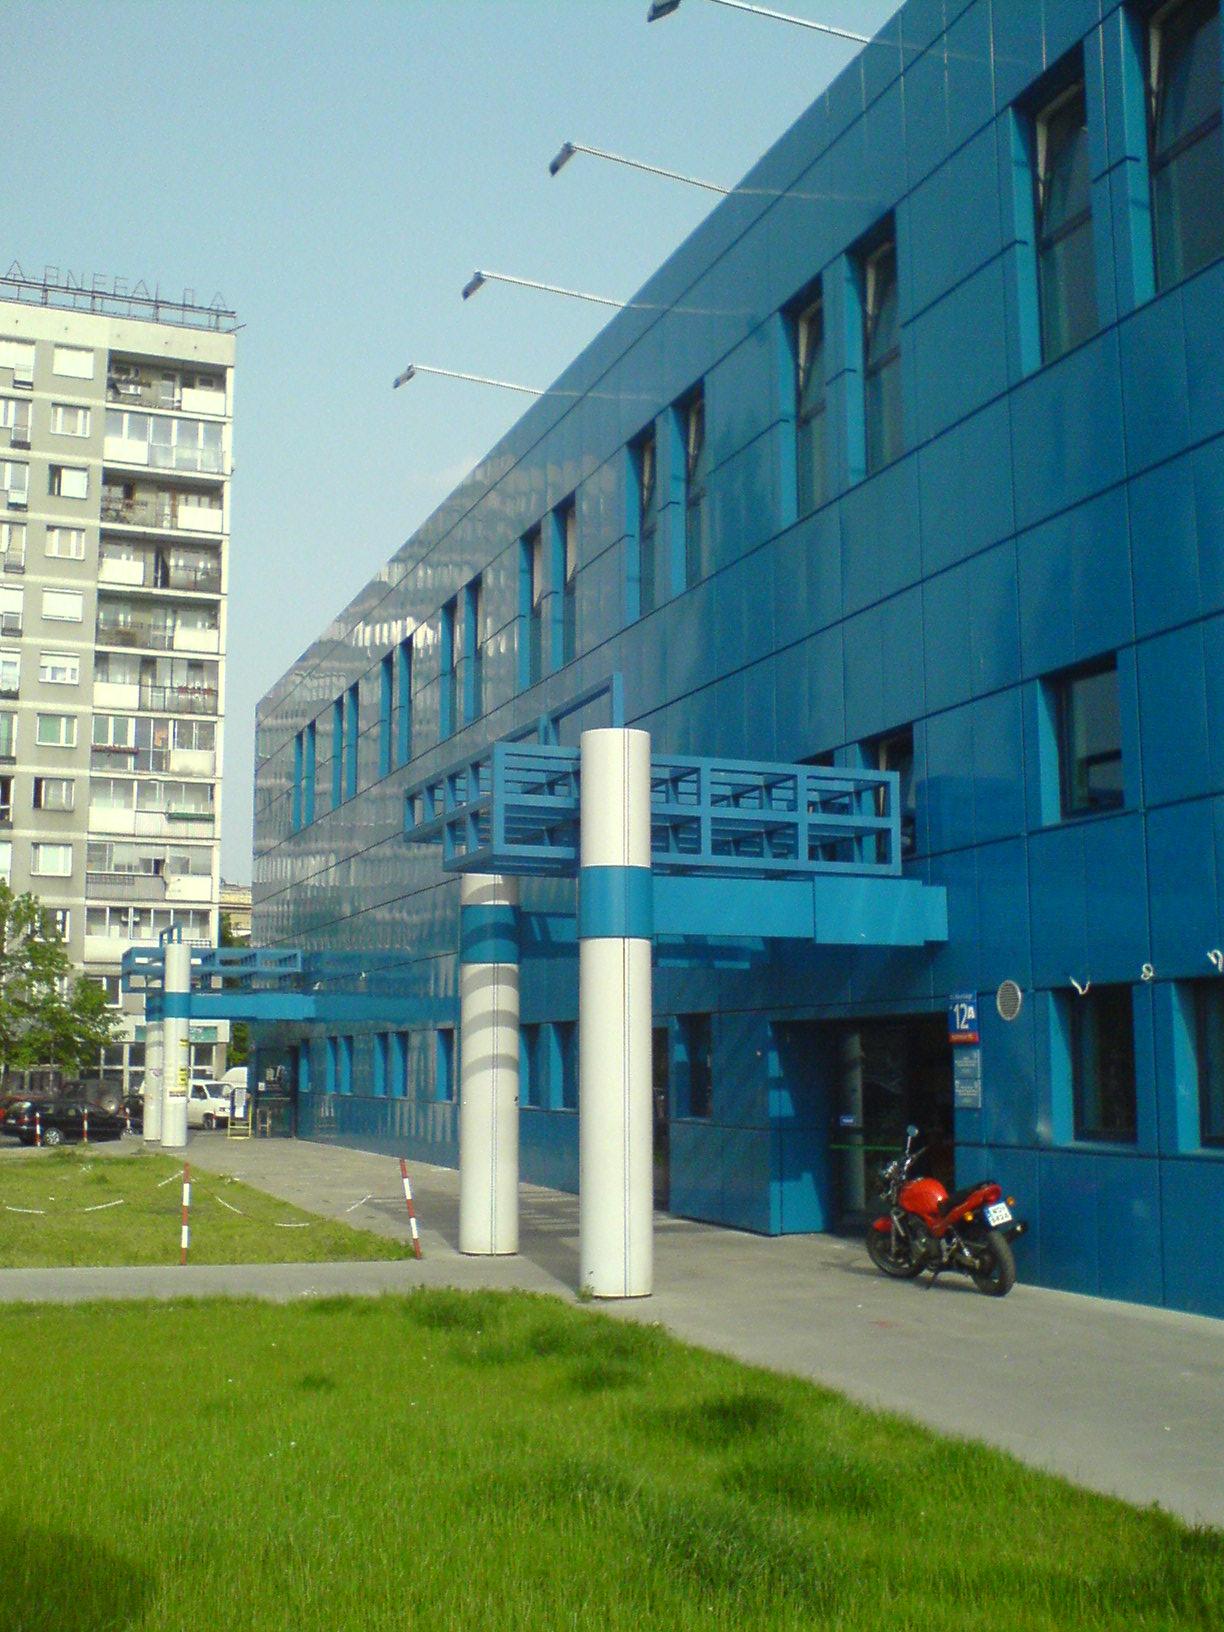 Szybki randki warszawa - 10 great places to meet Woman